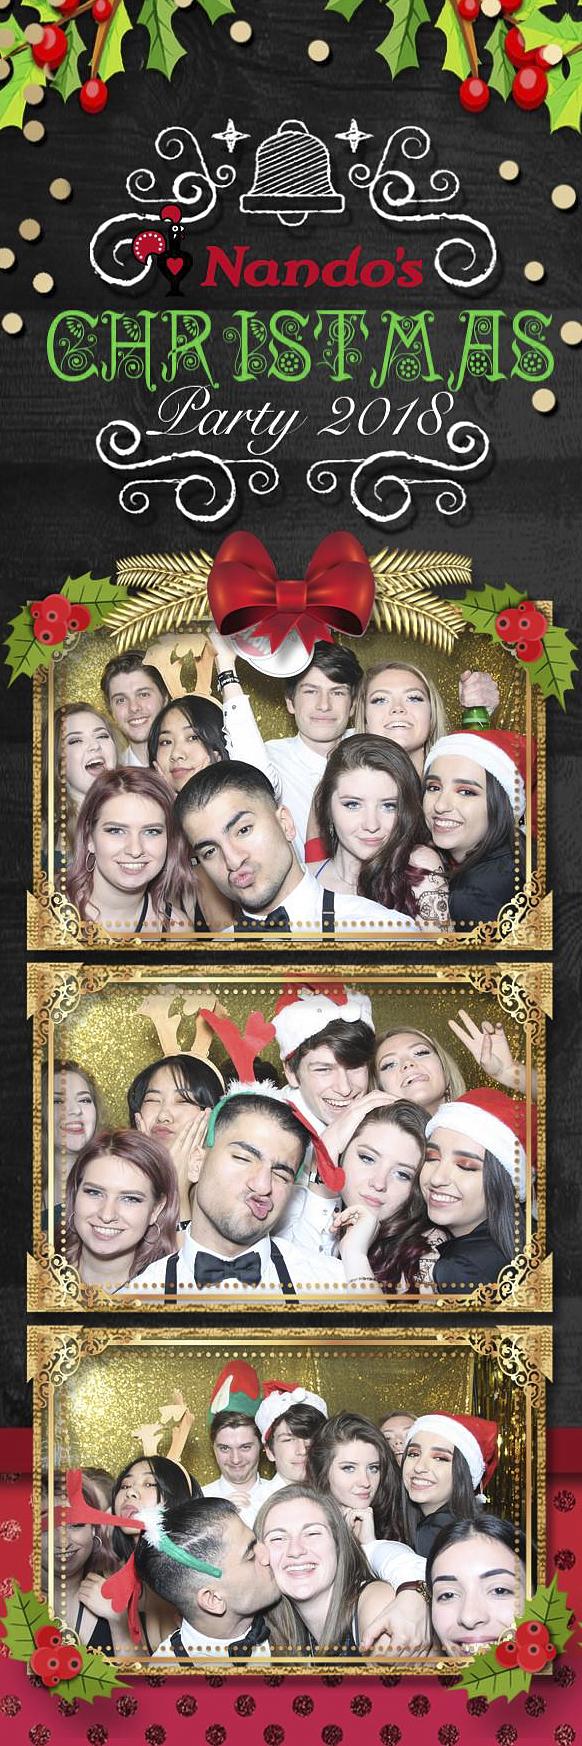 Nando's Christmas - December 2018